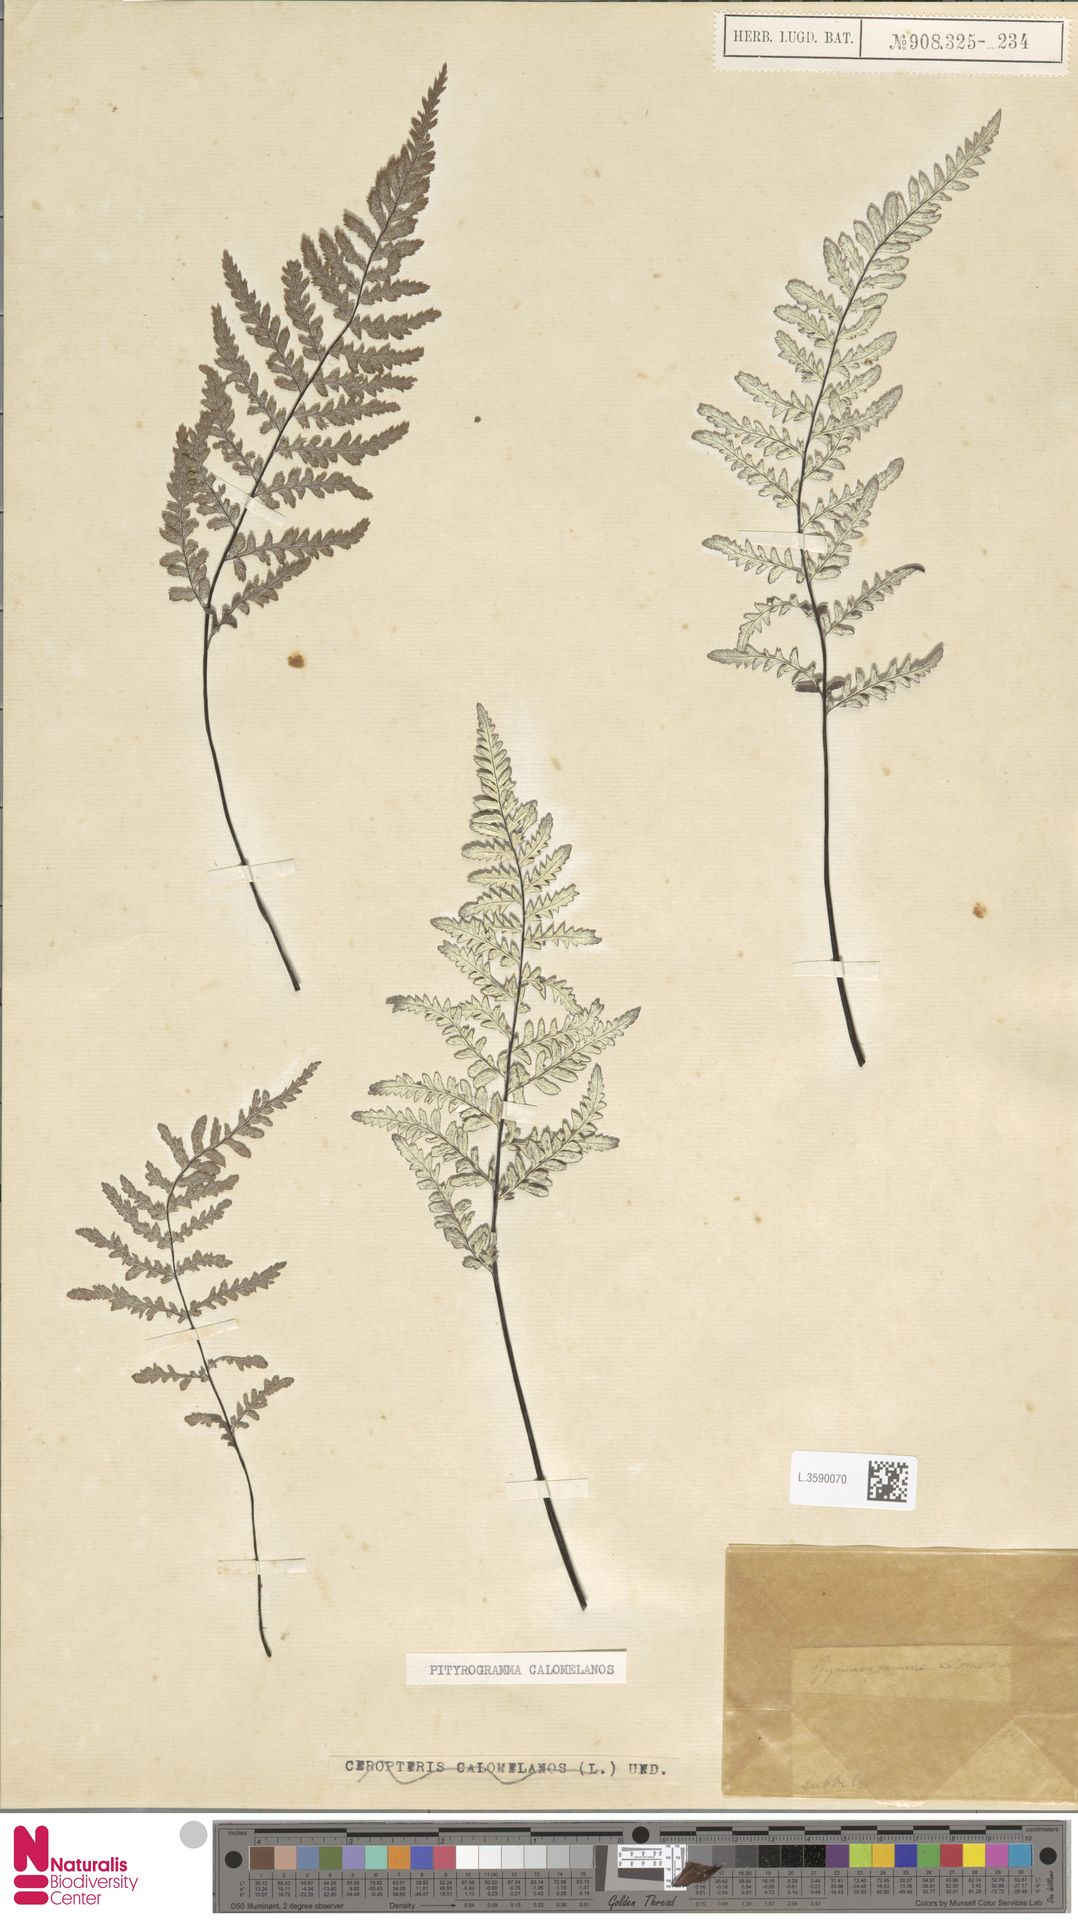 L.3590070 | Pityrogramma calomelanos (L.) Link